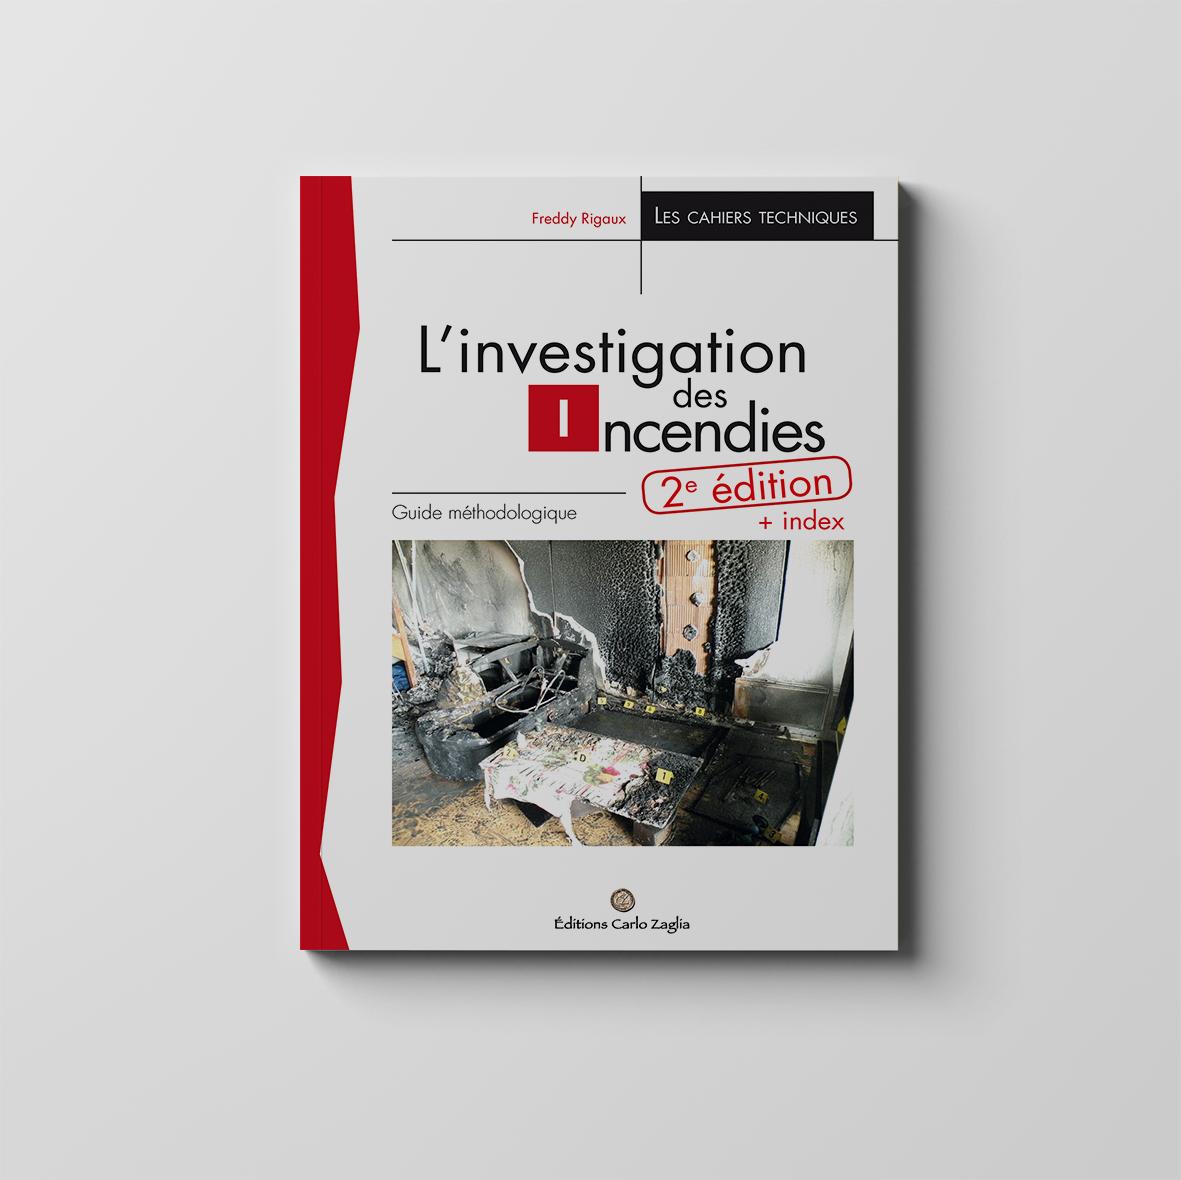 L'investigation des incendies